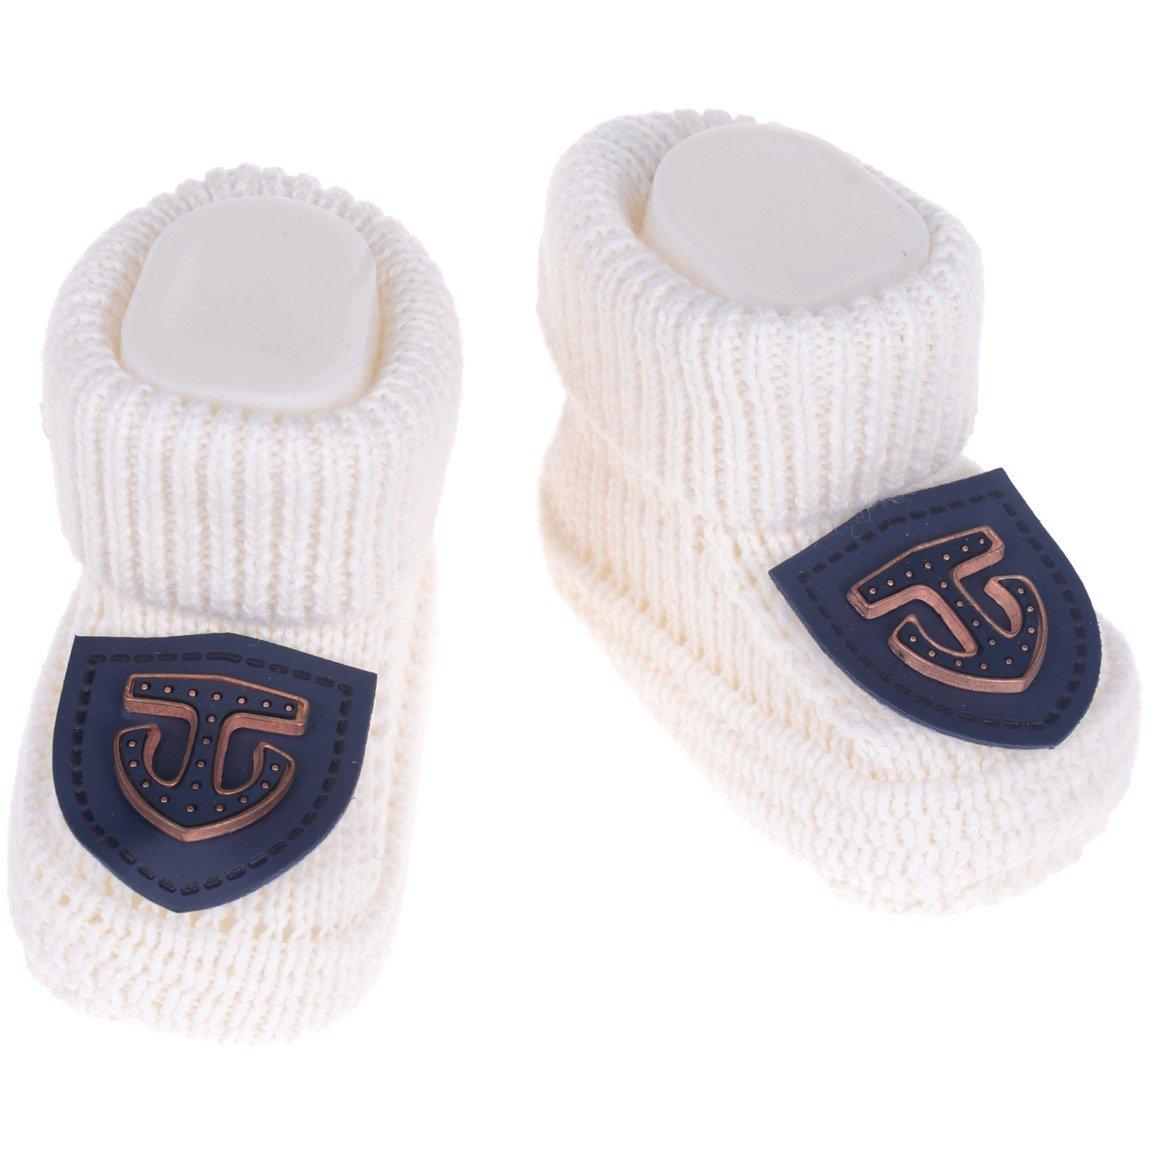 Eda βρεφικές κάλτσες πλεκτές «Anchor» - Παιδικά ρούχα ea3be47f7f8